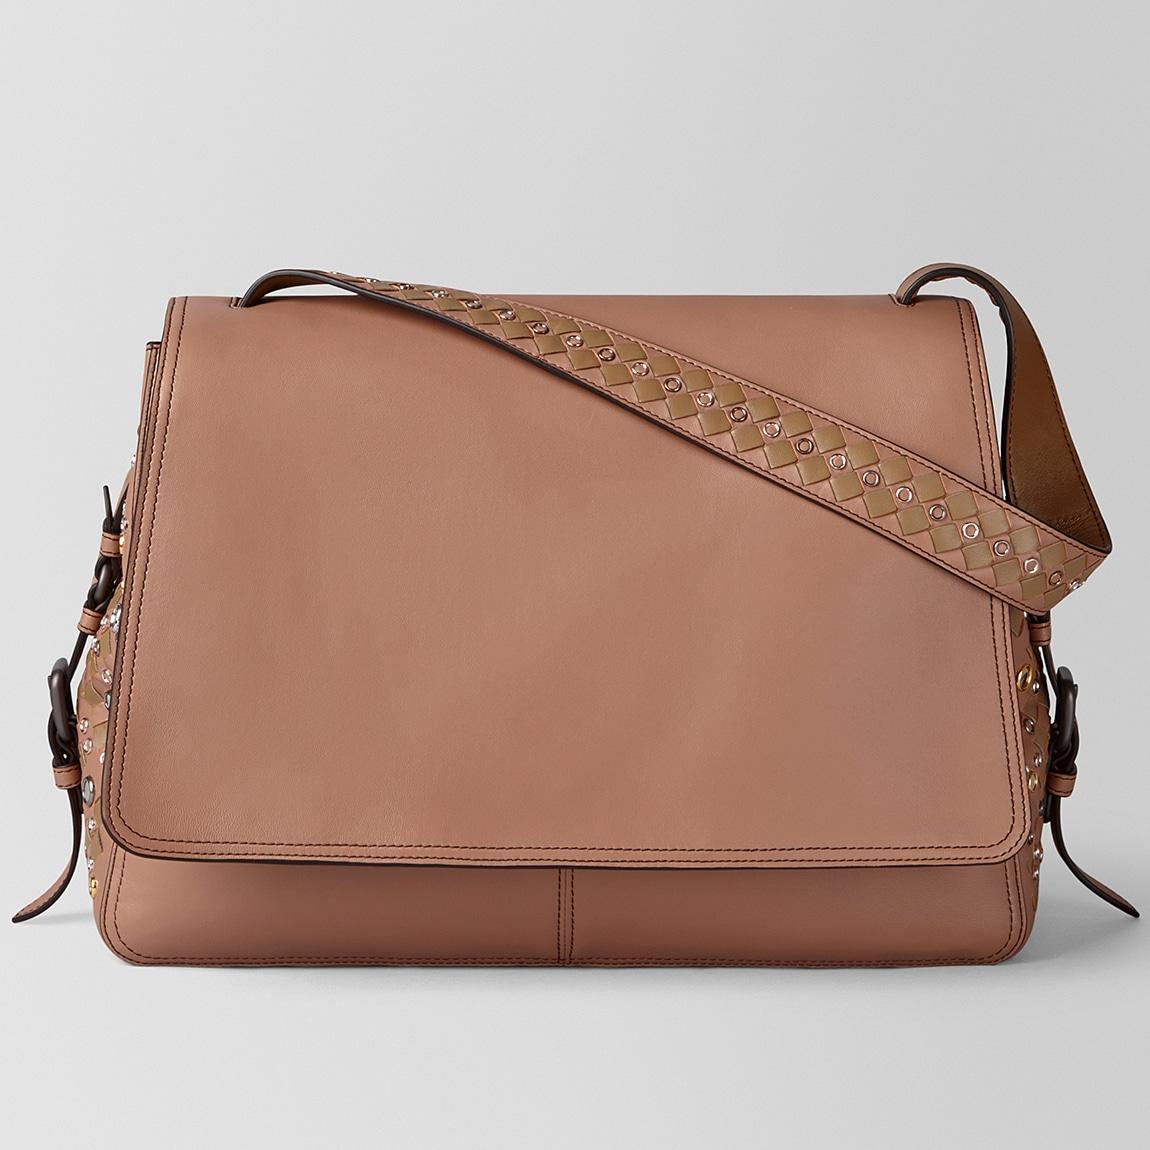 Bottega Veneta Spring Summer 2018 Bag Collection Features The BV73 ... b00bed5dcce82